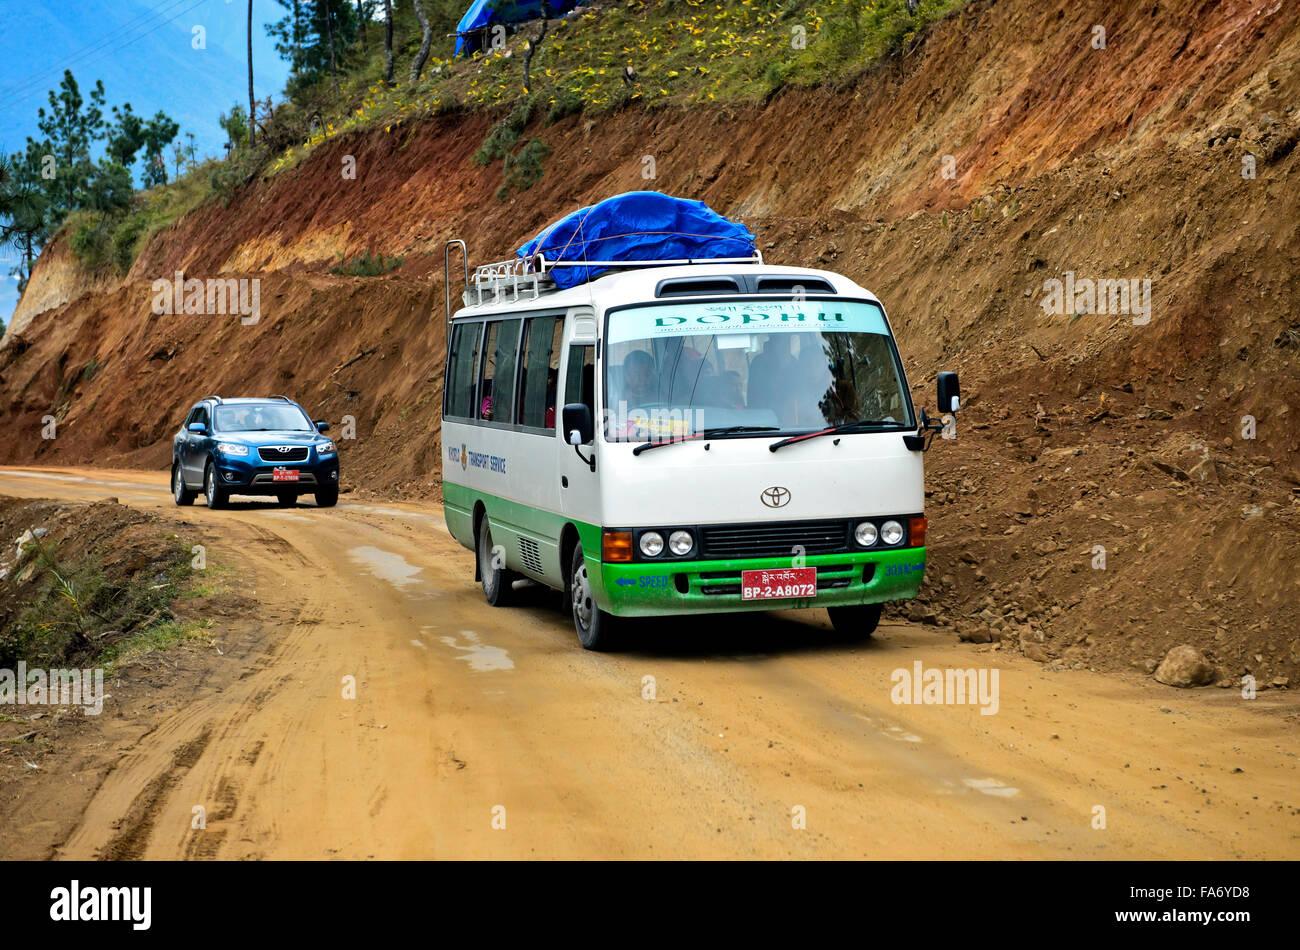 Transporte en autobús local en la carretera de Punakha Thimphu, Bután Imagen De Stock